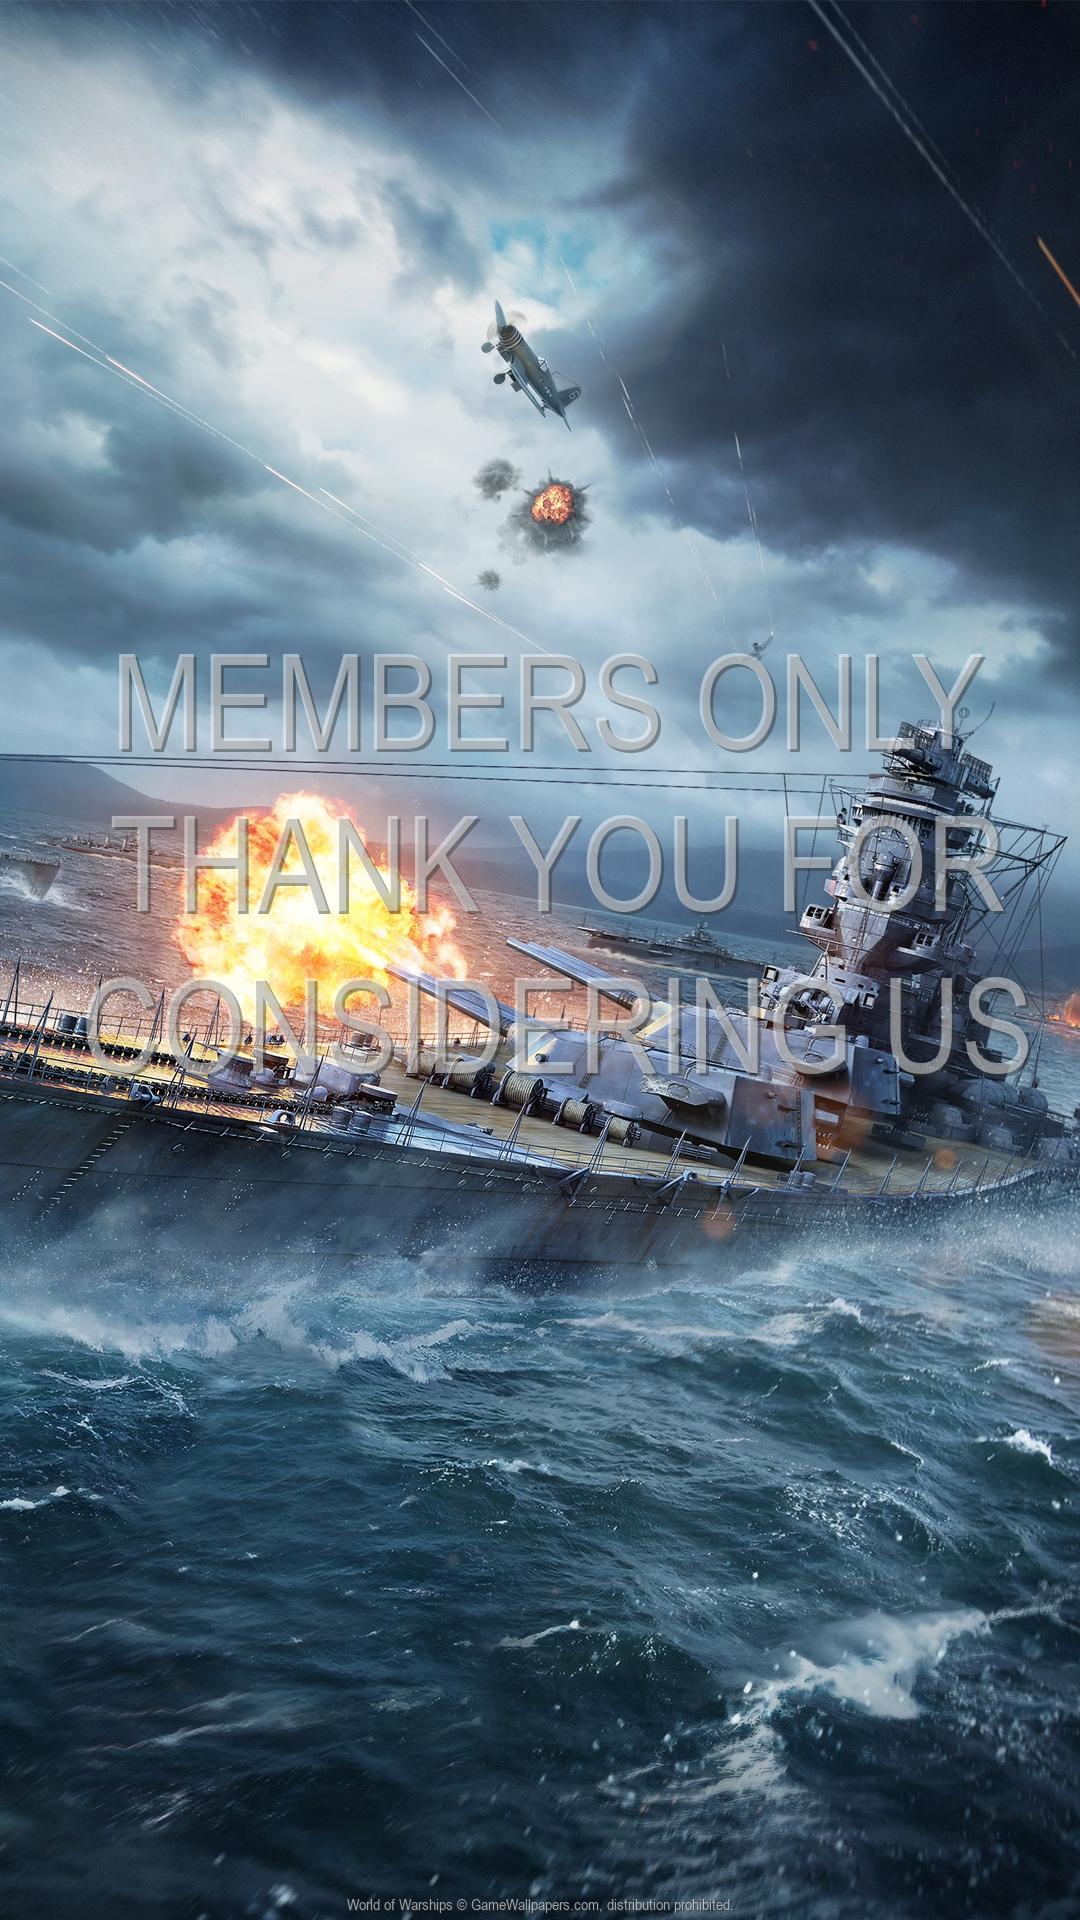 World of Warships 1920x1080 Handy Hintergrundbild 04